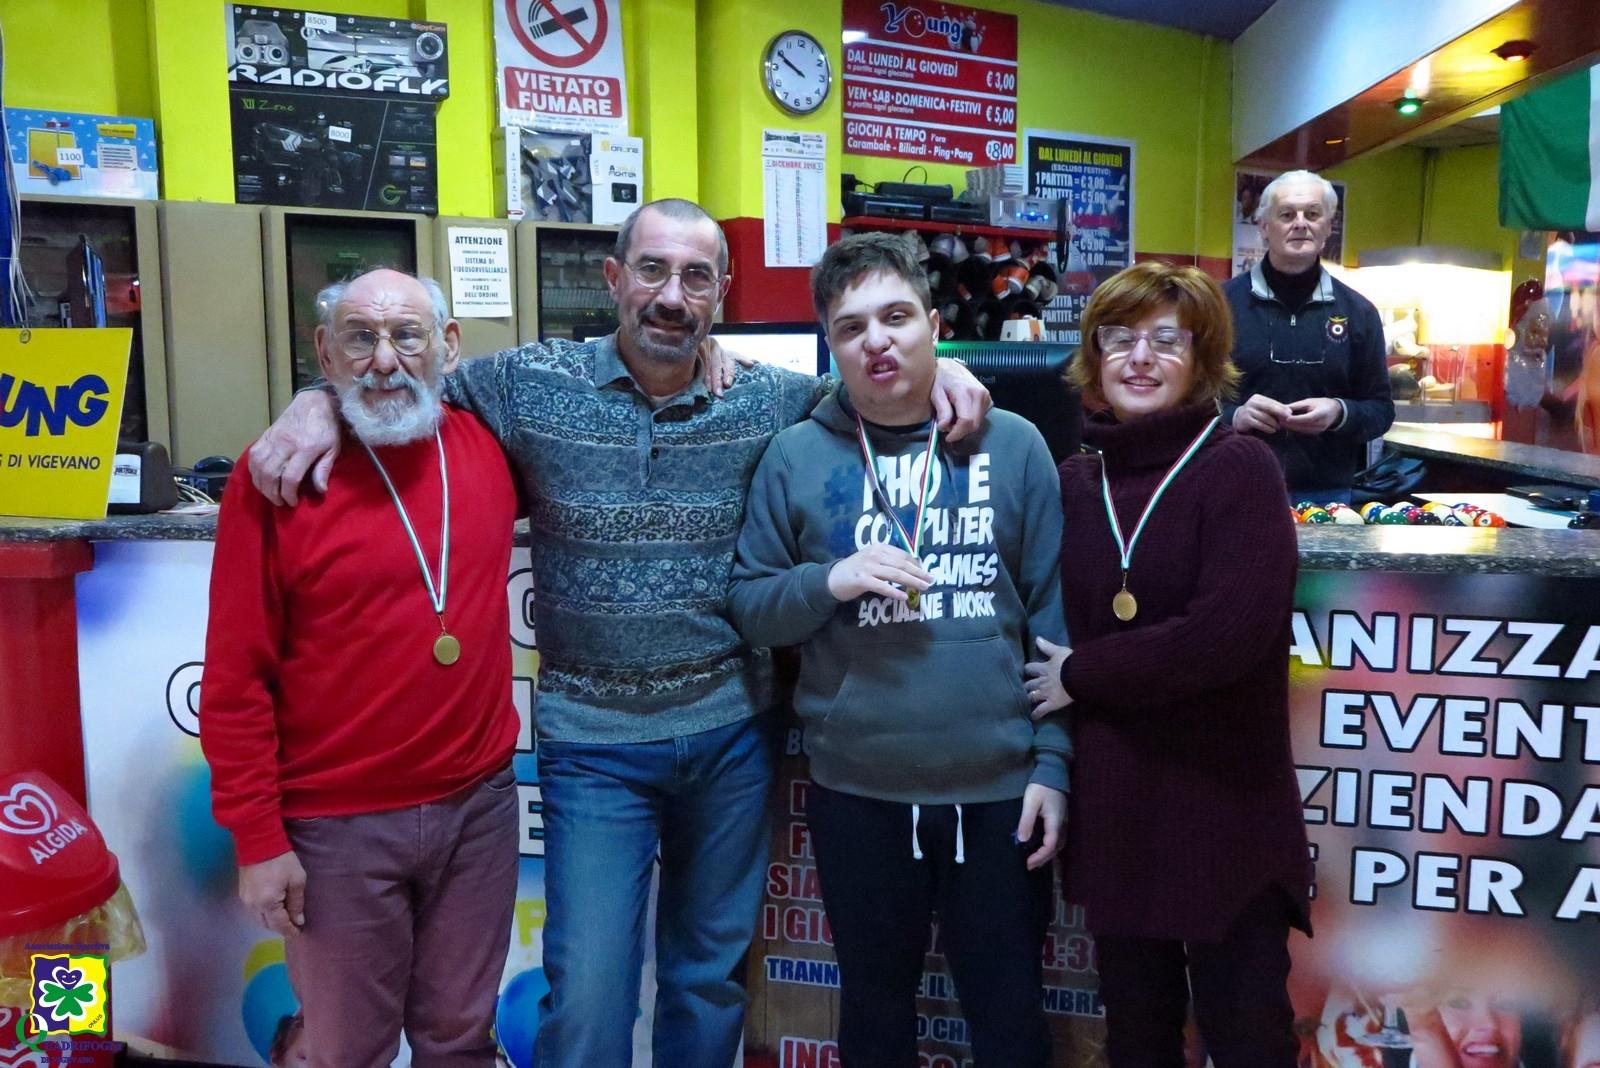 Torneo Bowling Vigevano 19-12-2018 - 093